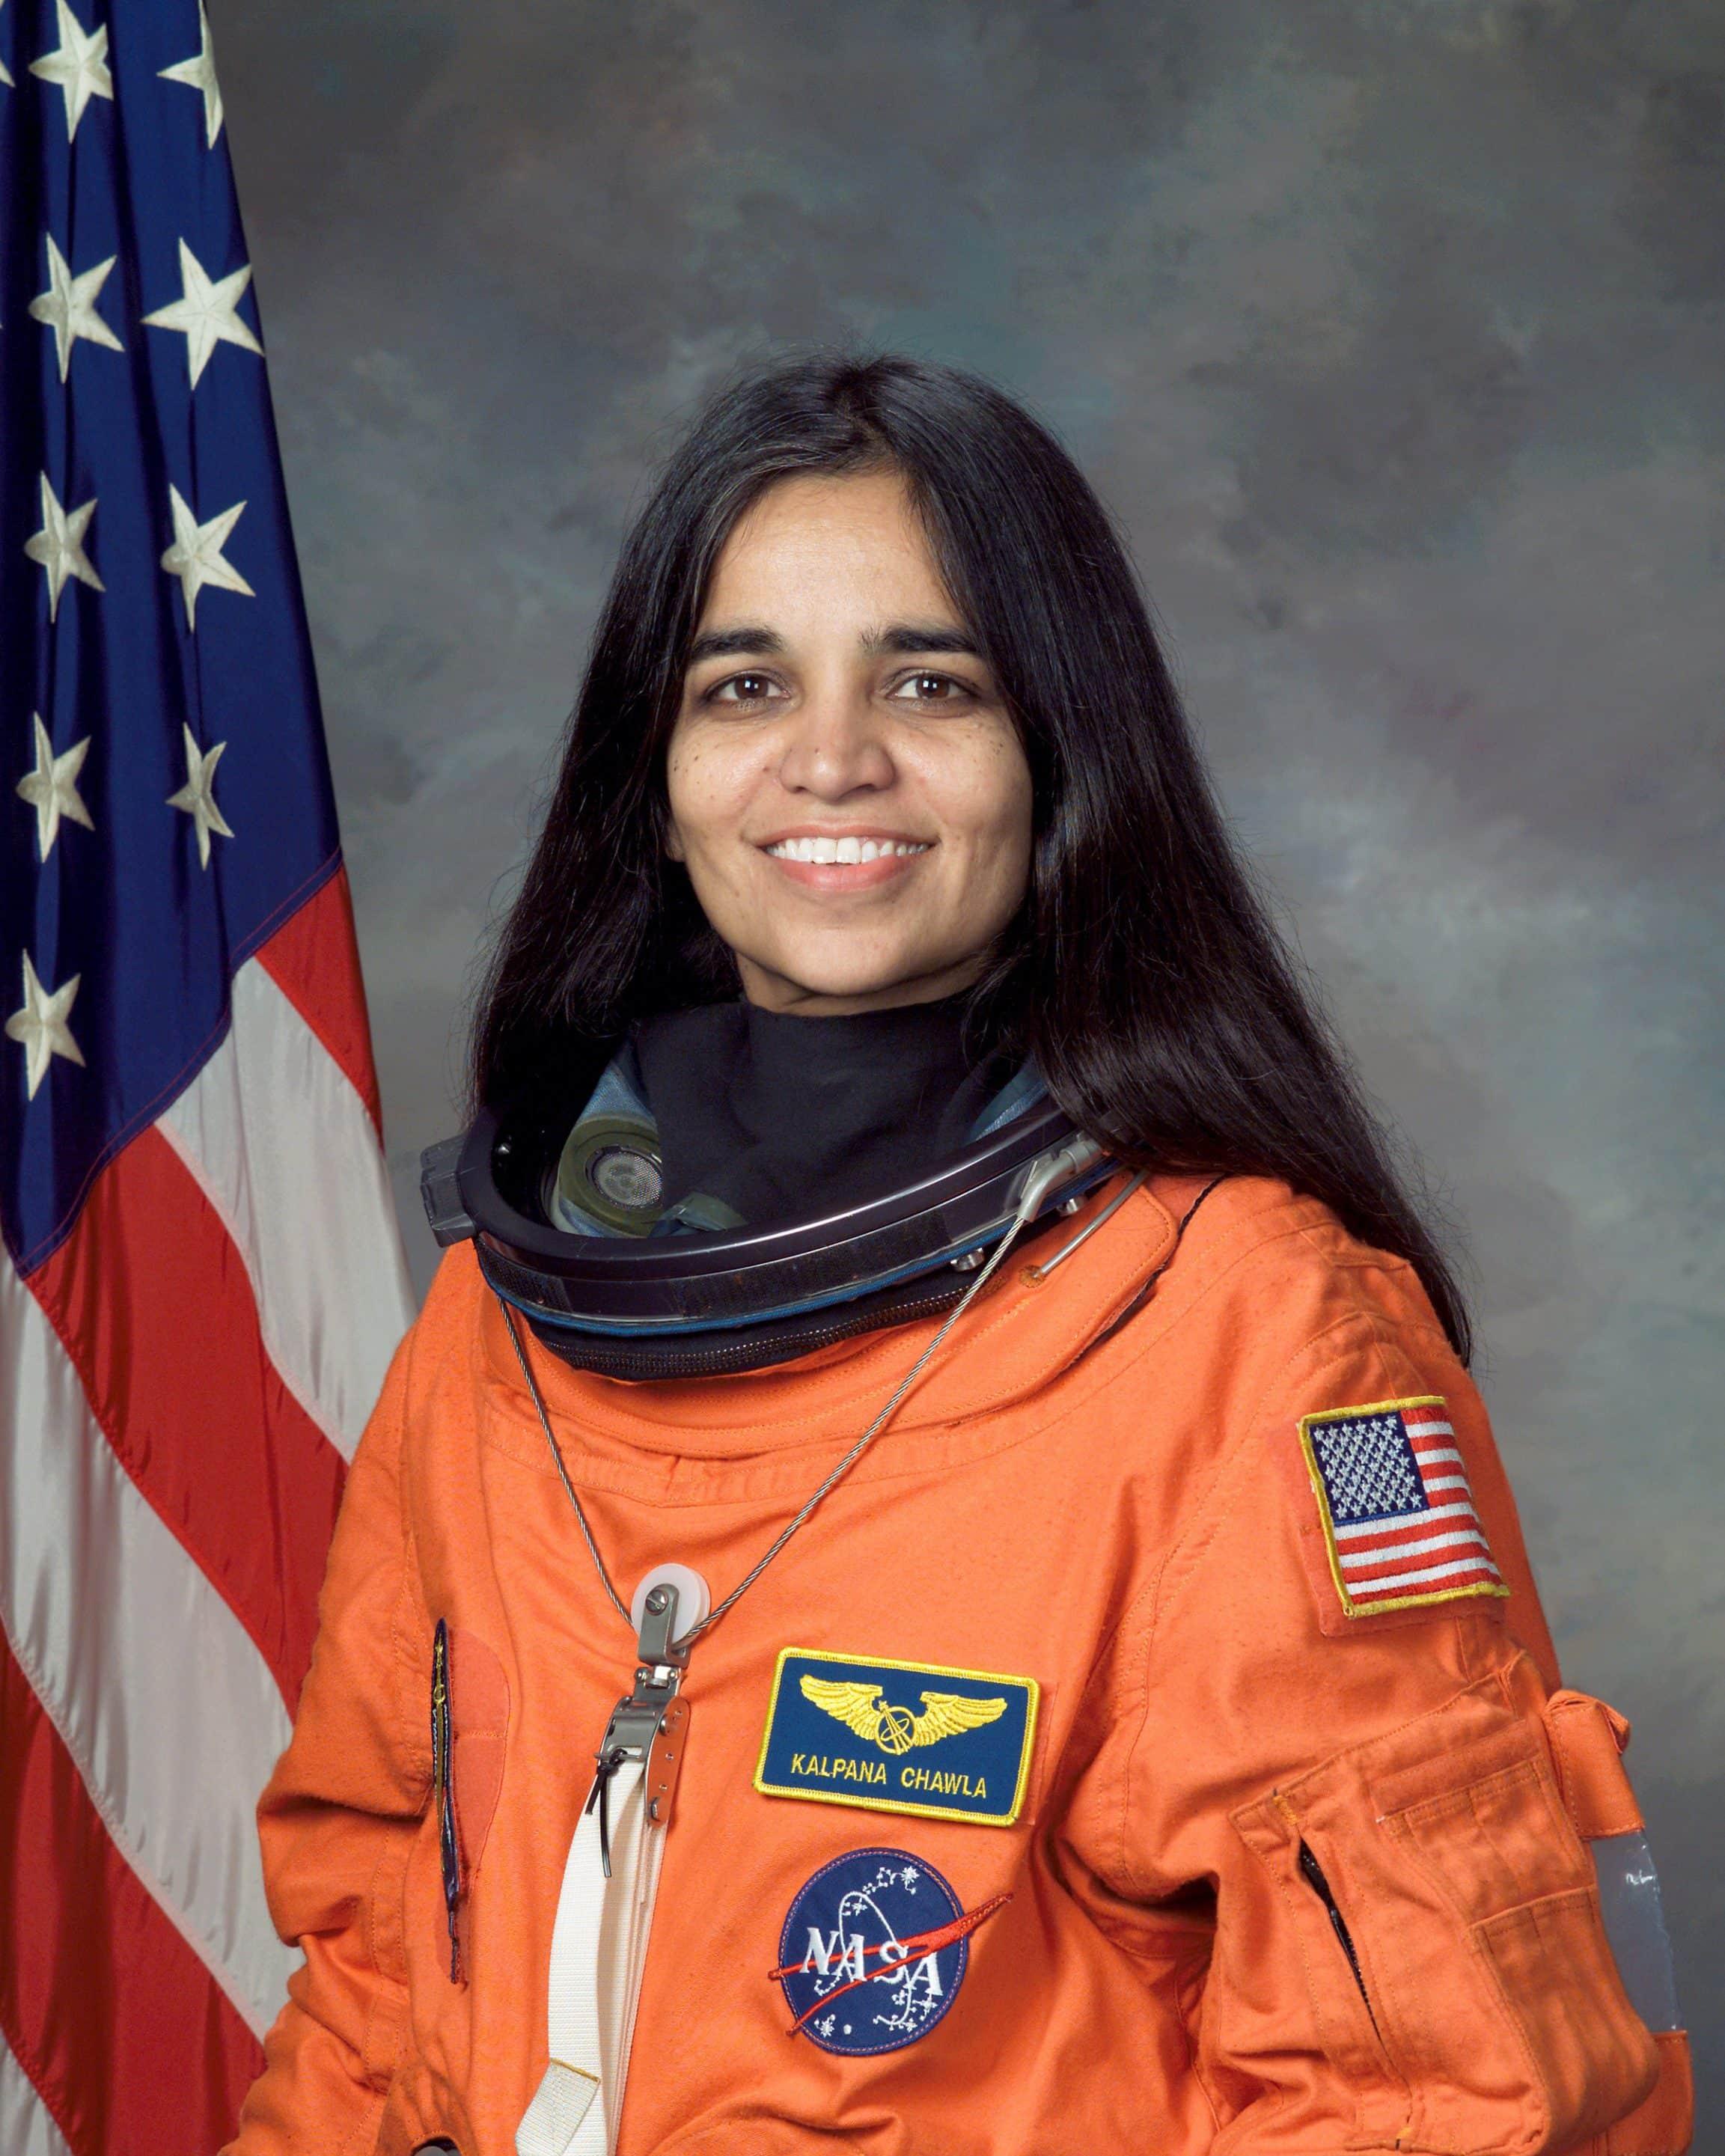 Kalpana Chawla- India